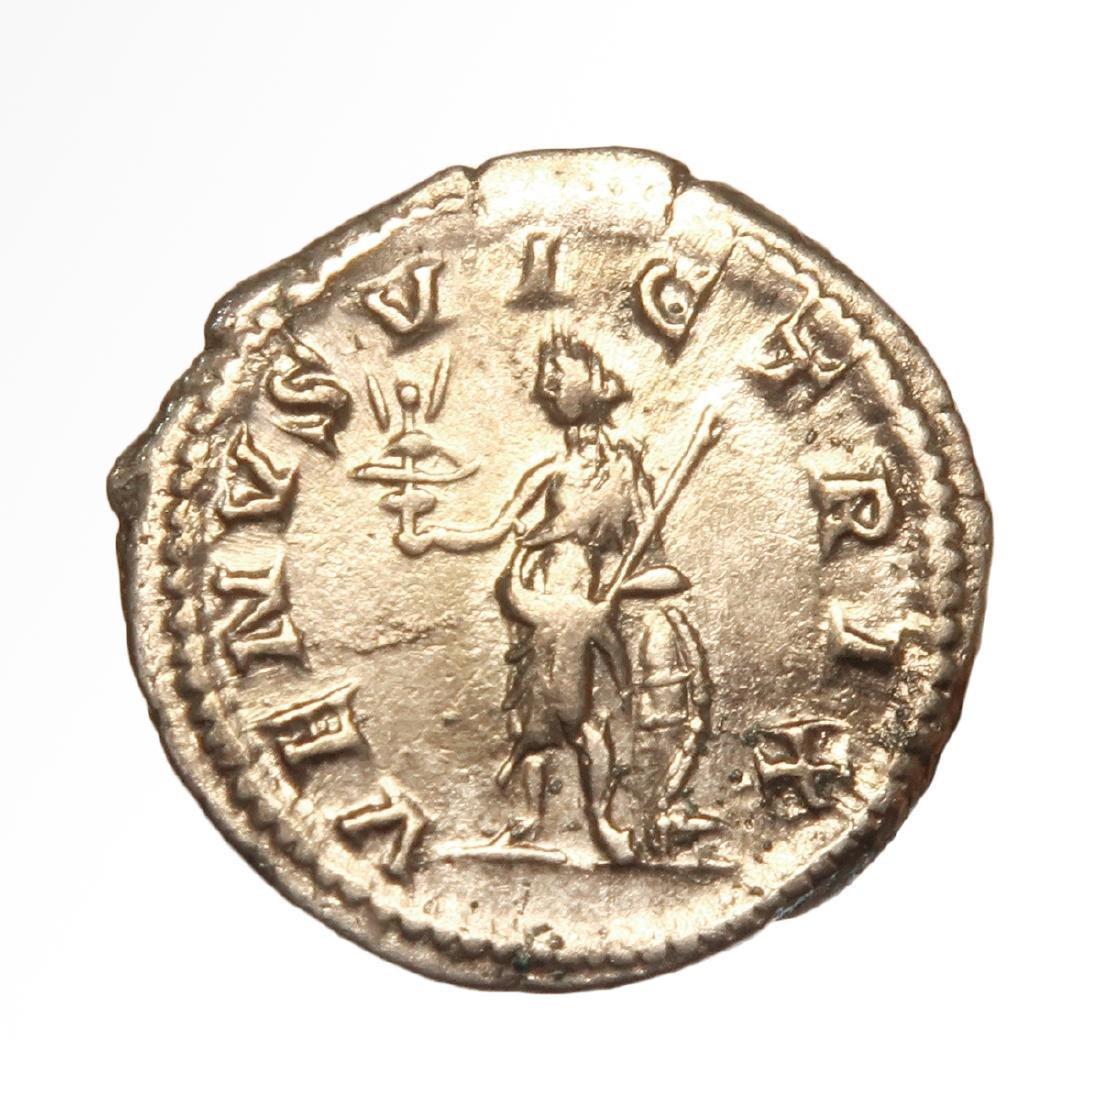 Roman Silver Denarius, Severus Alexander, Mint of Rome - 2